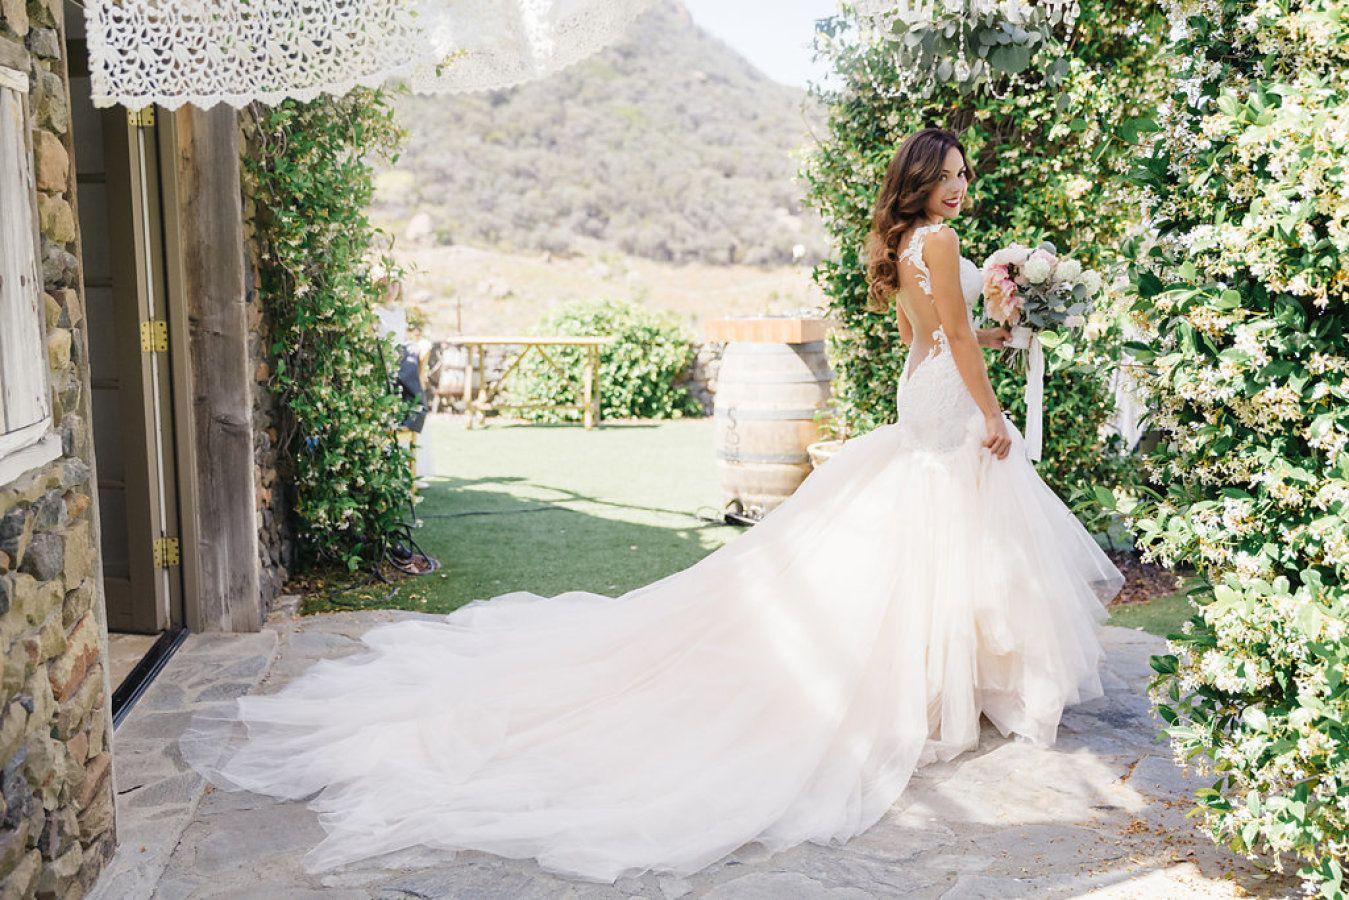 Stunning chiffon train: http://www.stylemepretty.com/2015/09/28/romantic-malibu-vineyard-wedding/ | Photography: Jana Williams - http://jana-williams.com/